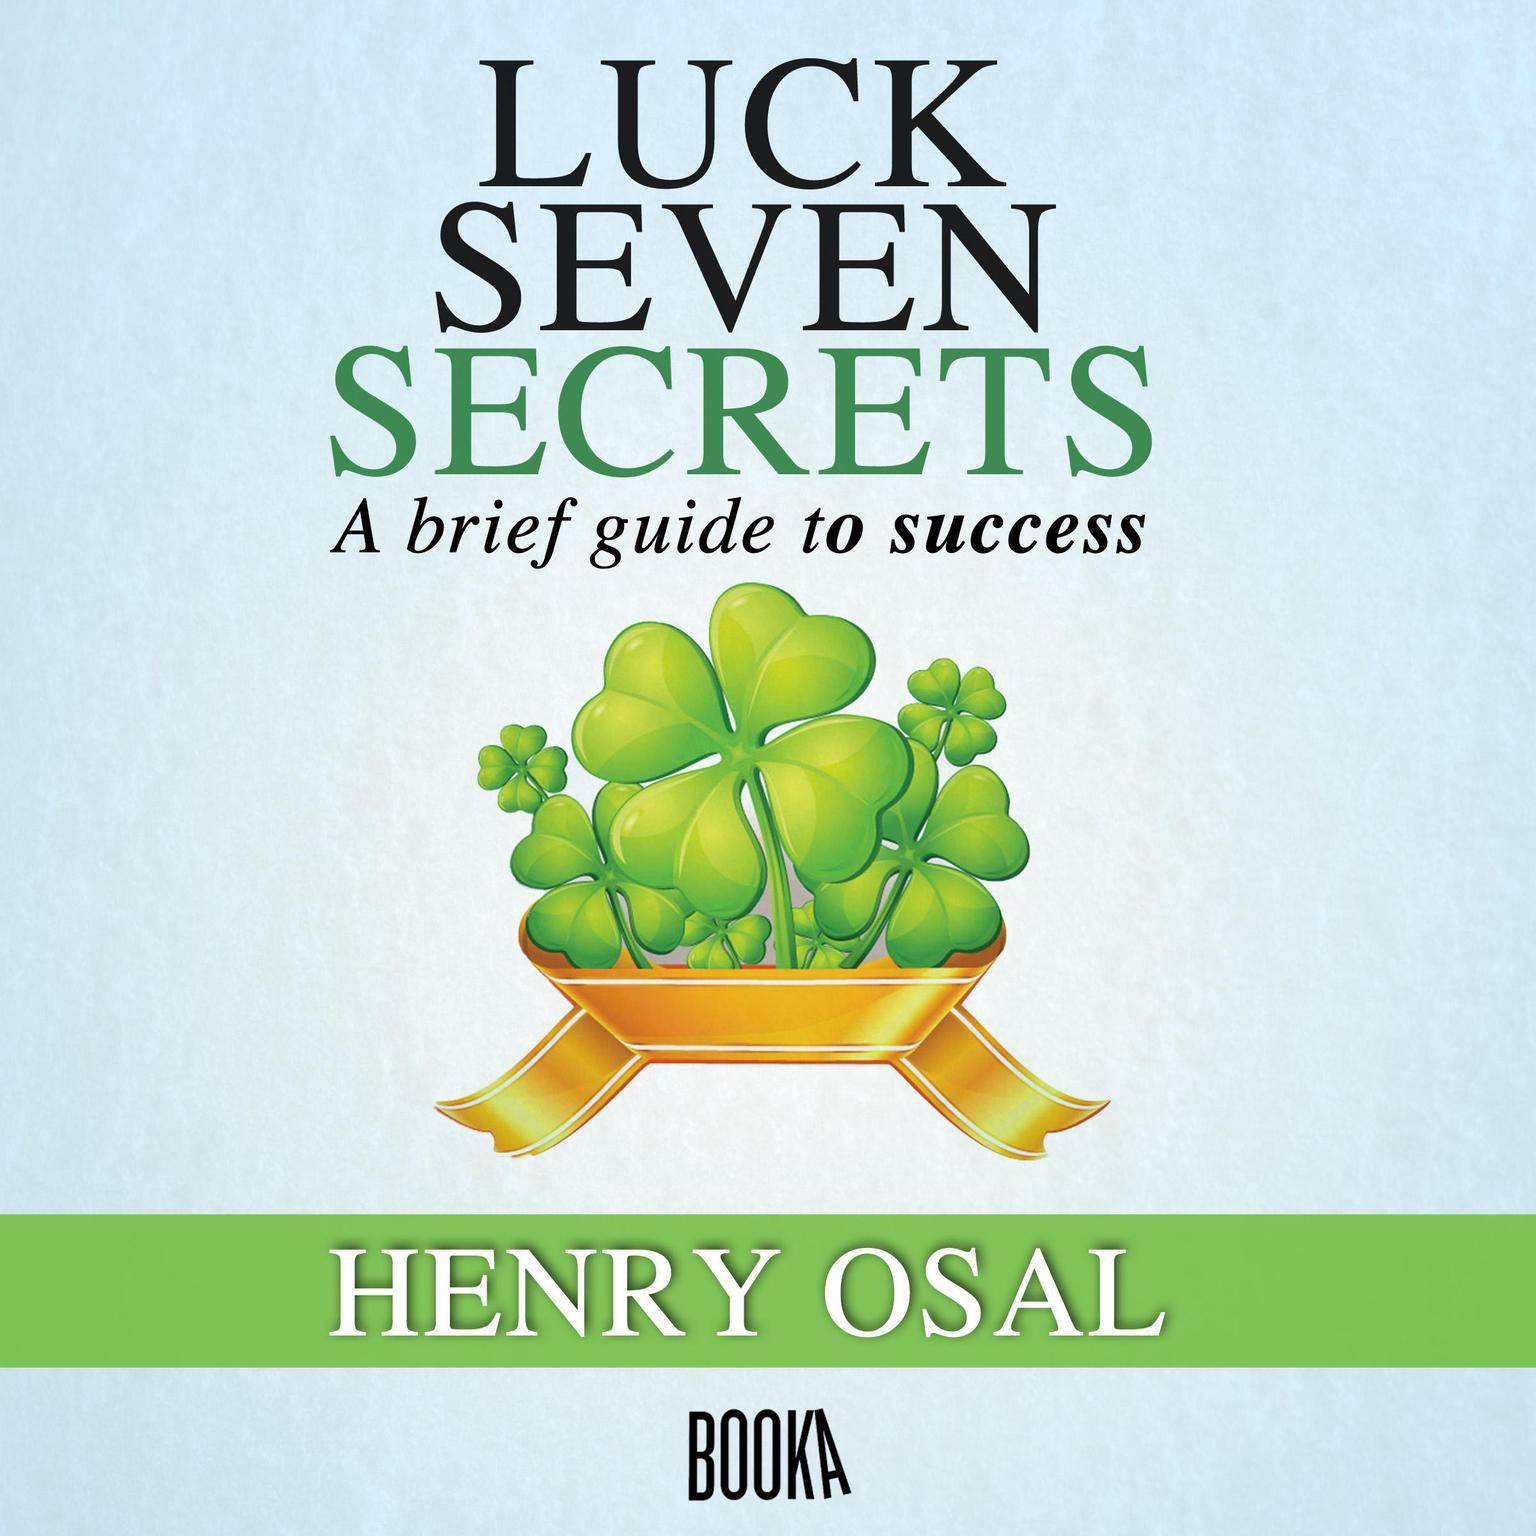 Suerte Siete secretos (Luck Seven Secrets) Audiobook, by Henry Osal